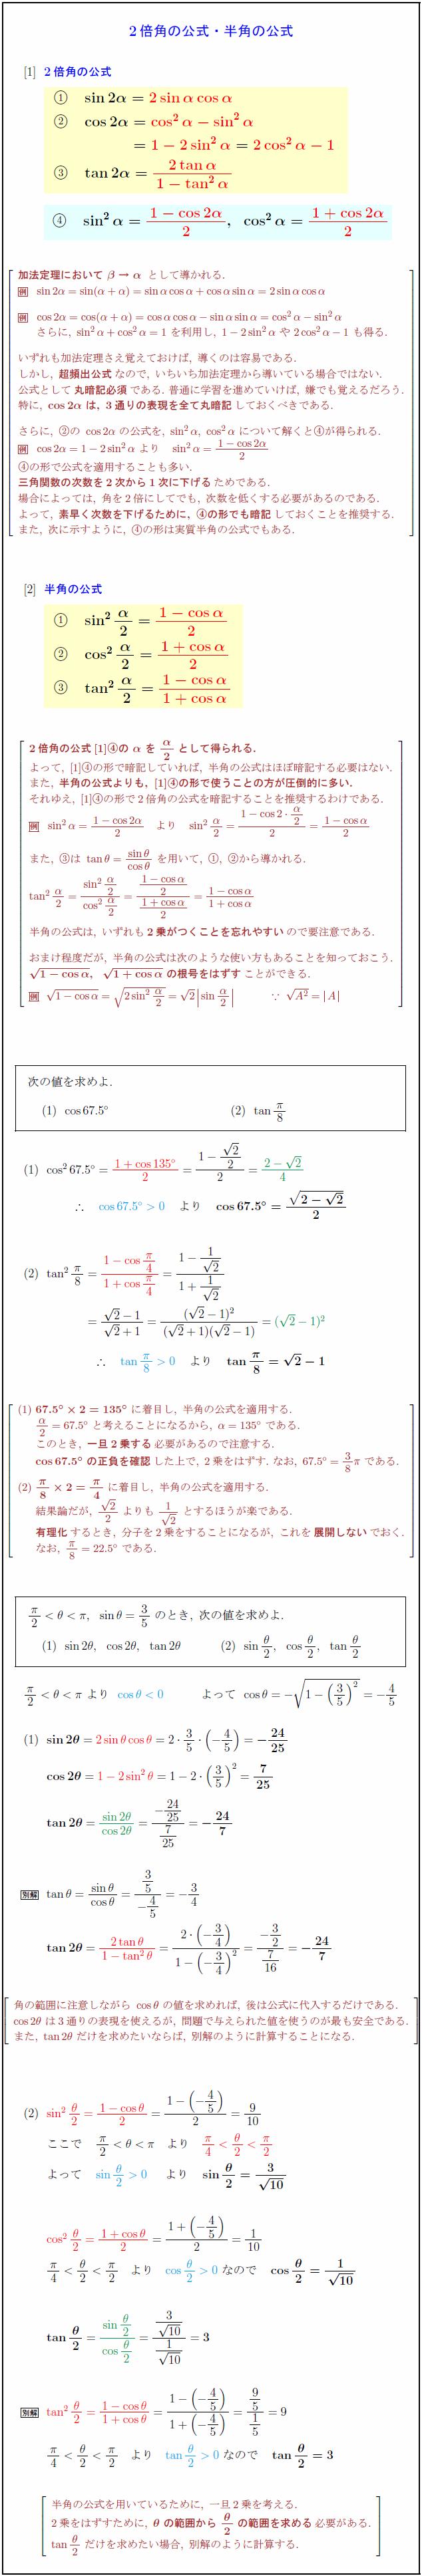 double-angle-formula